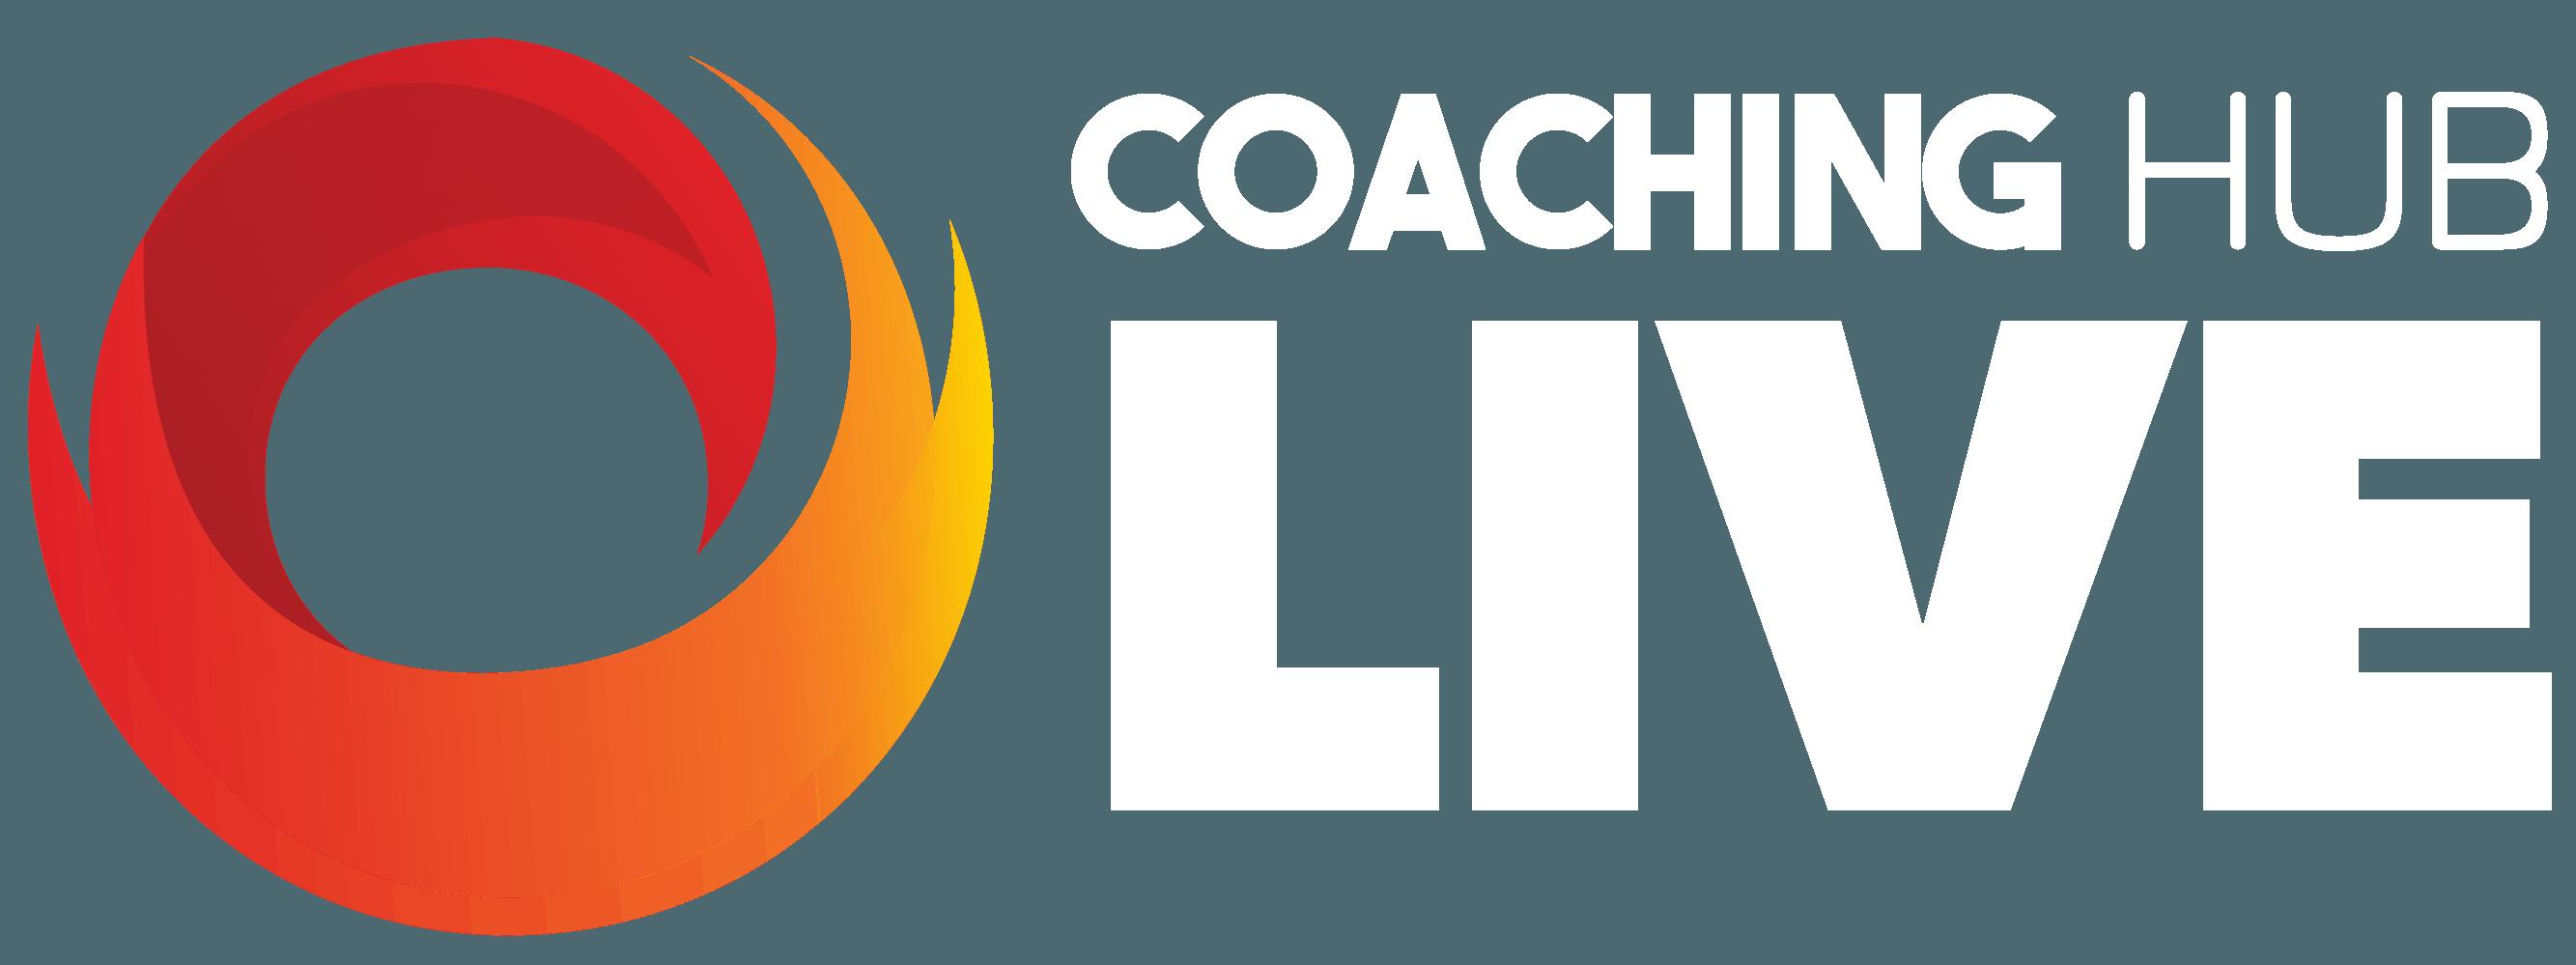 Coaching Hub Live